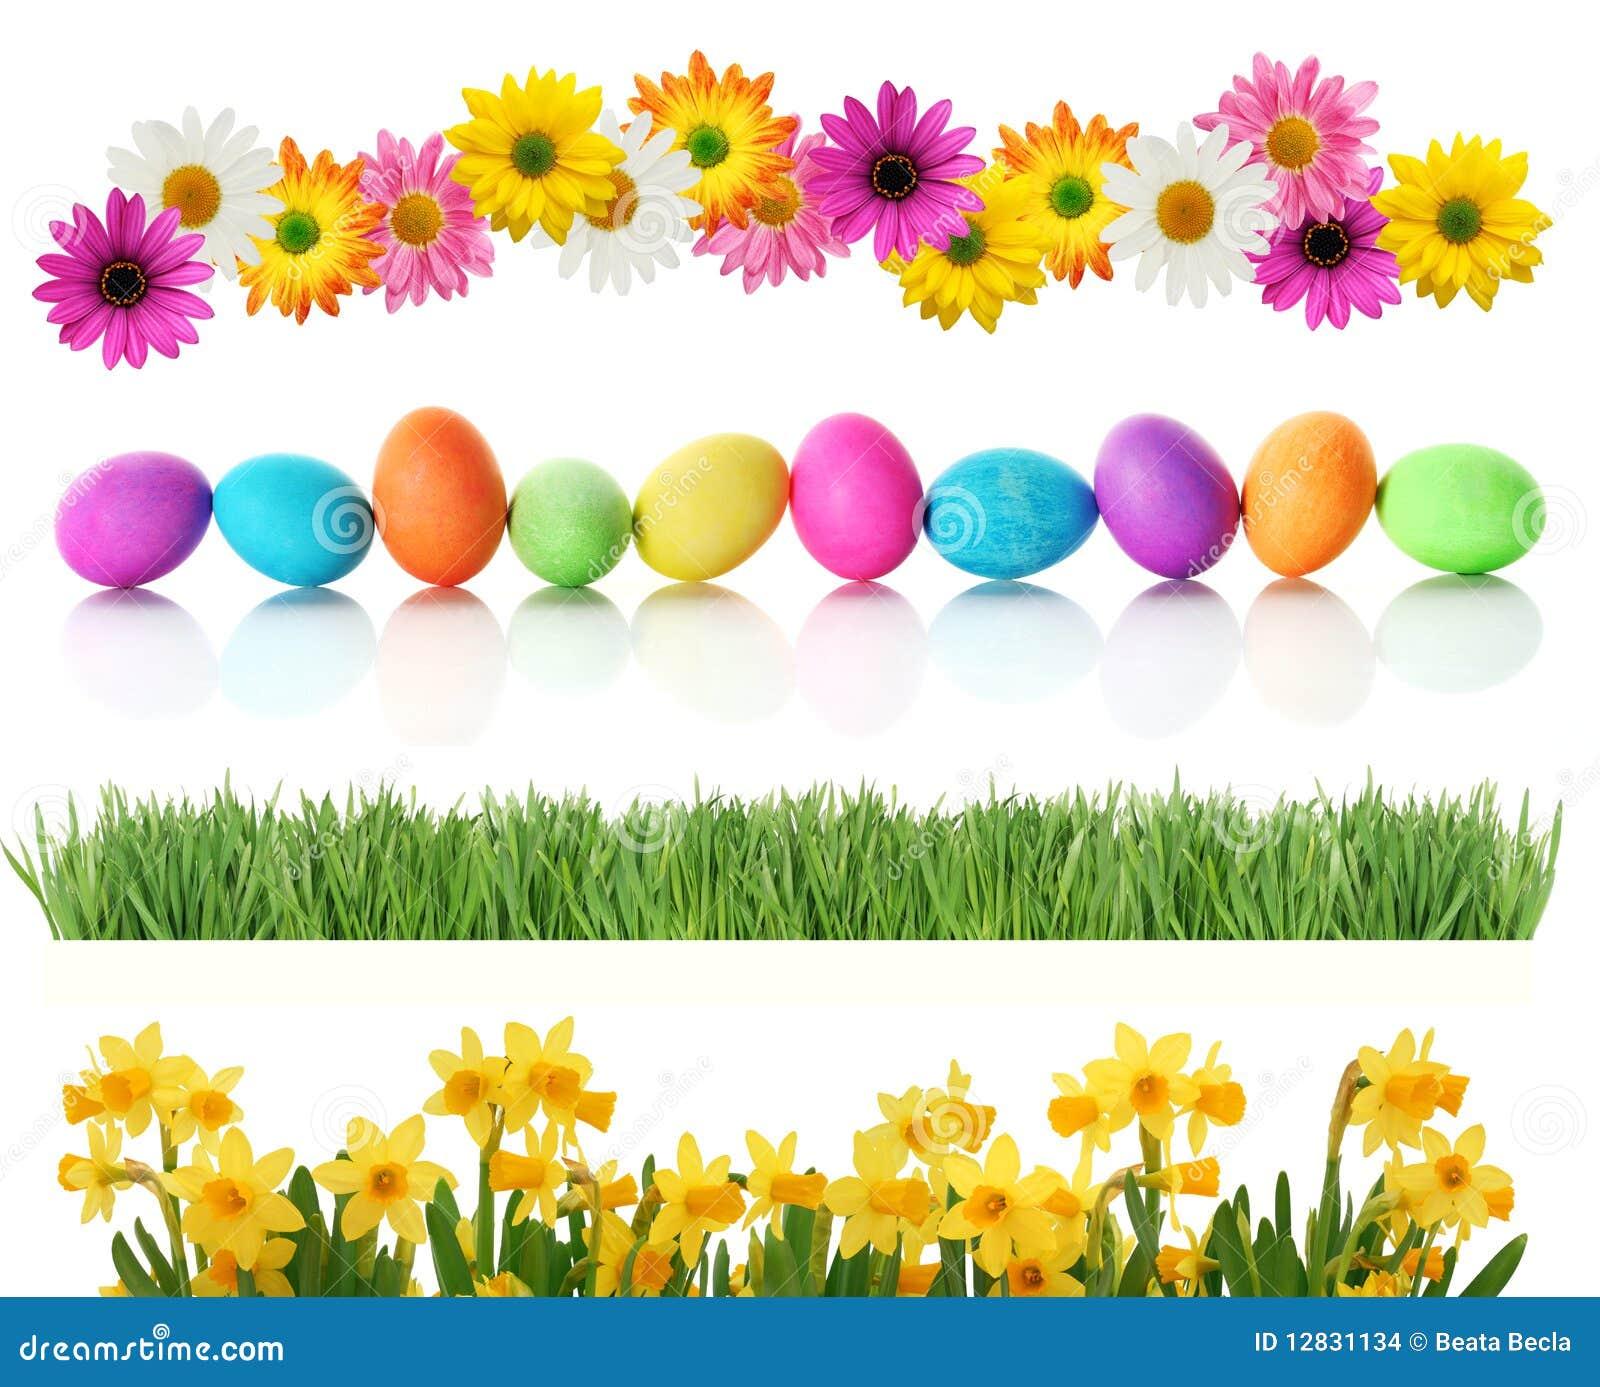 Spring Easter borders